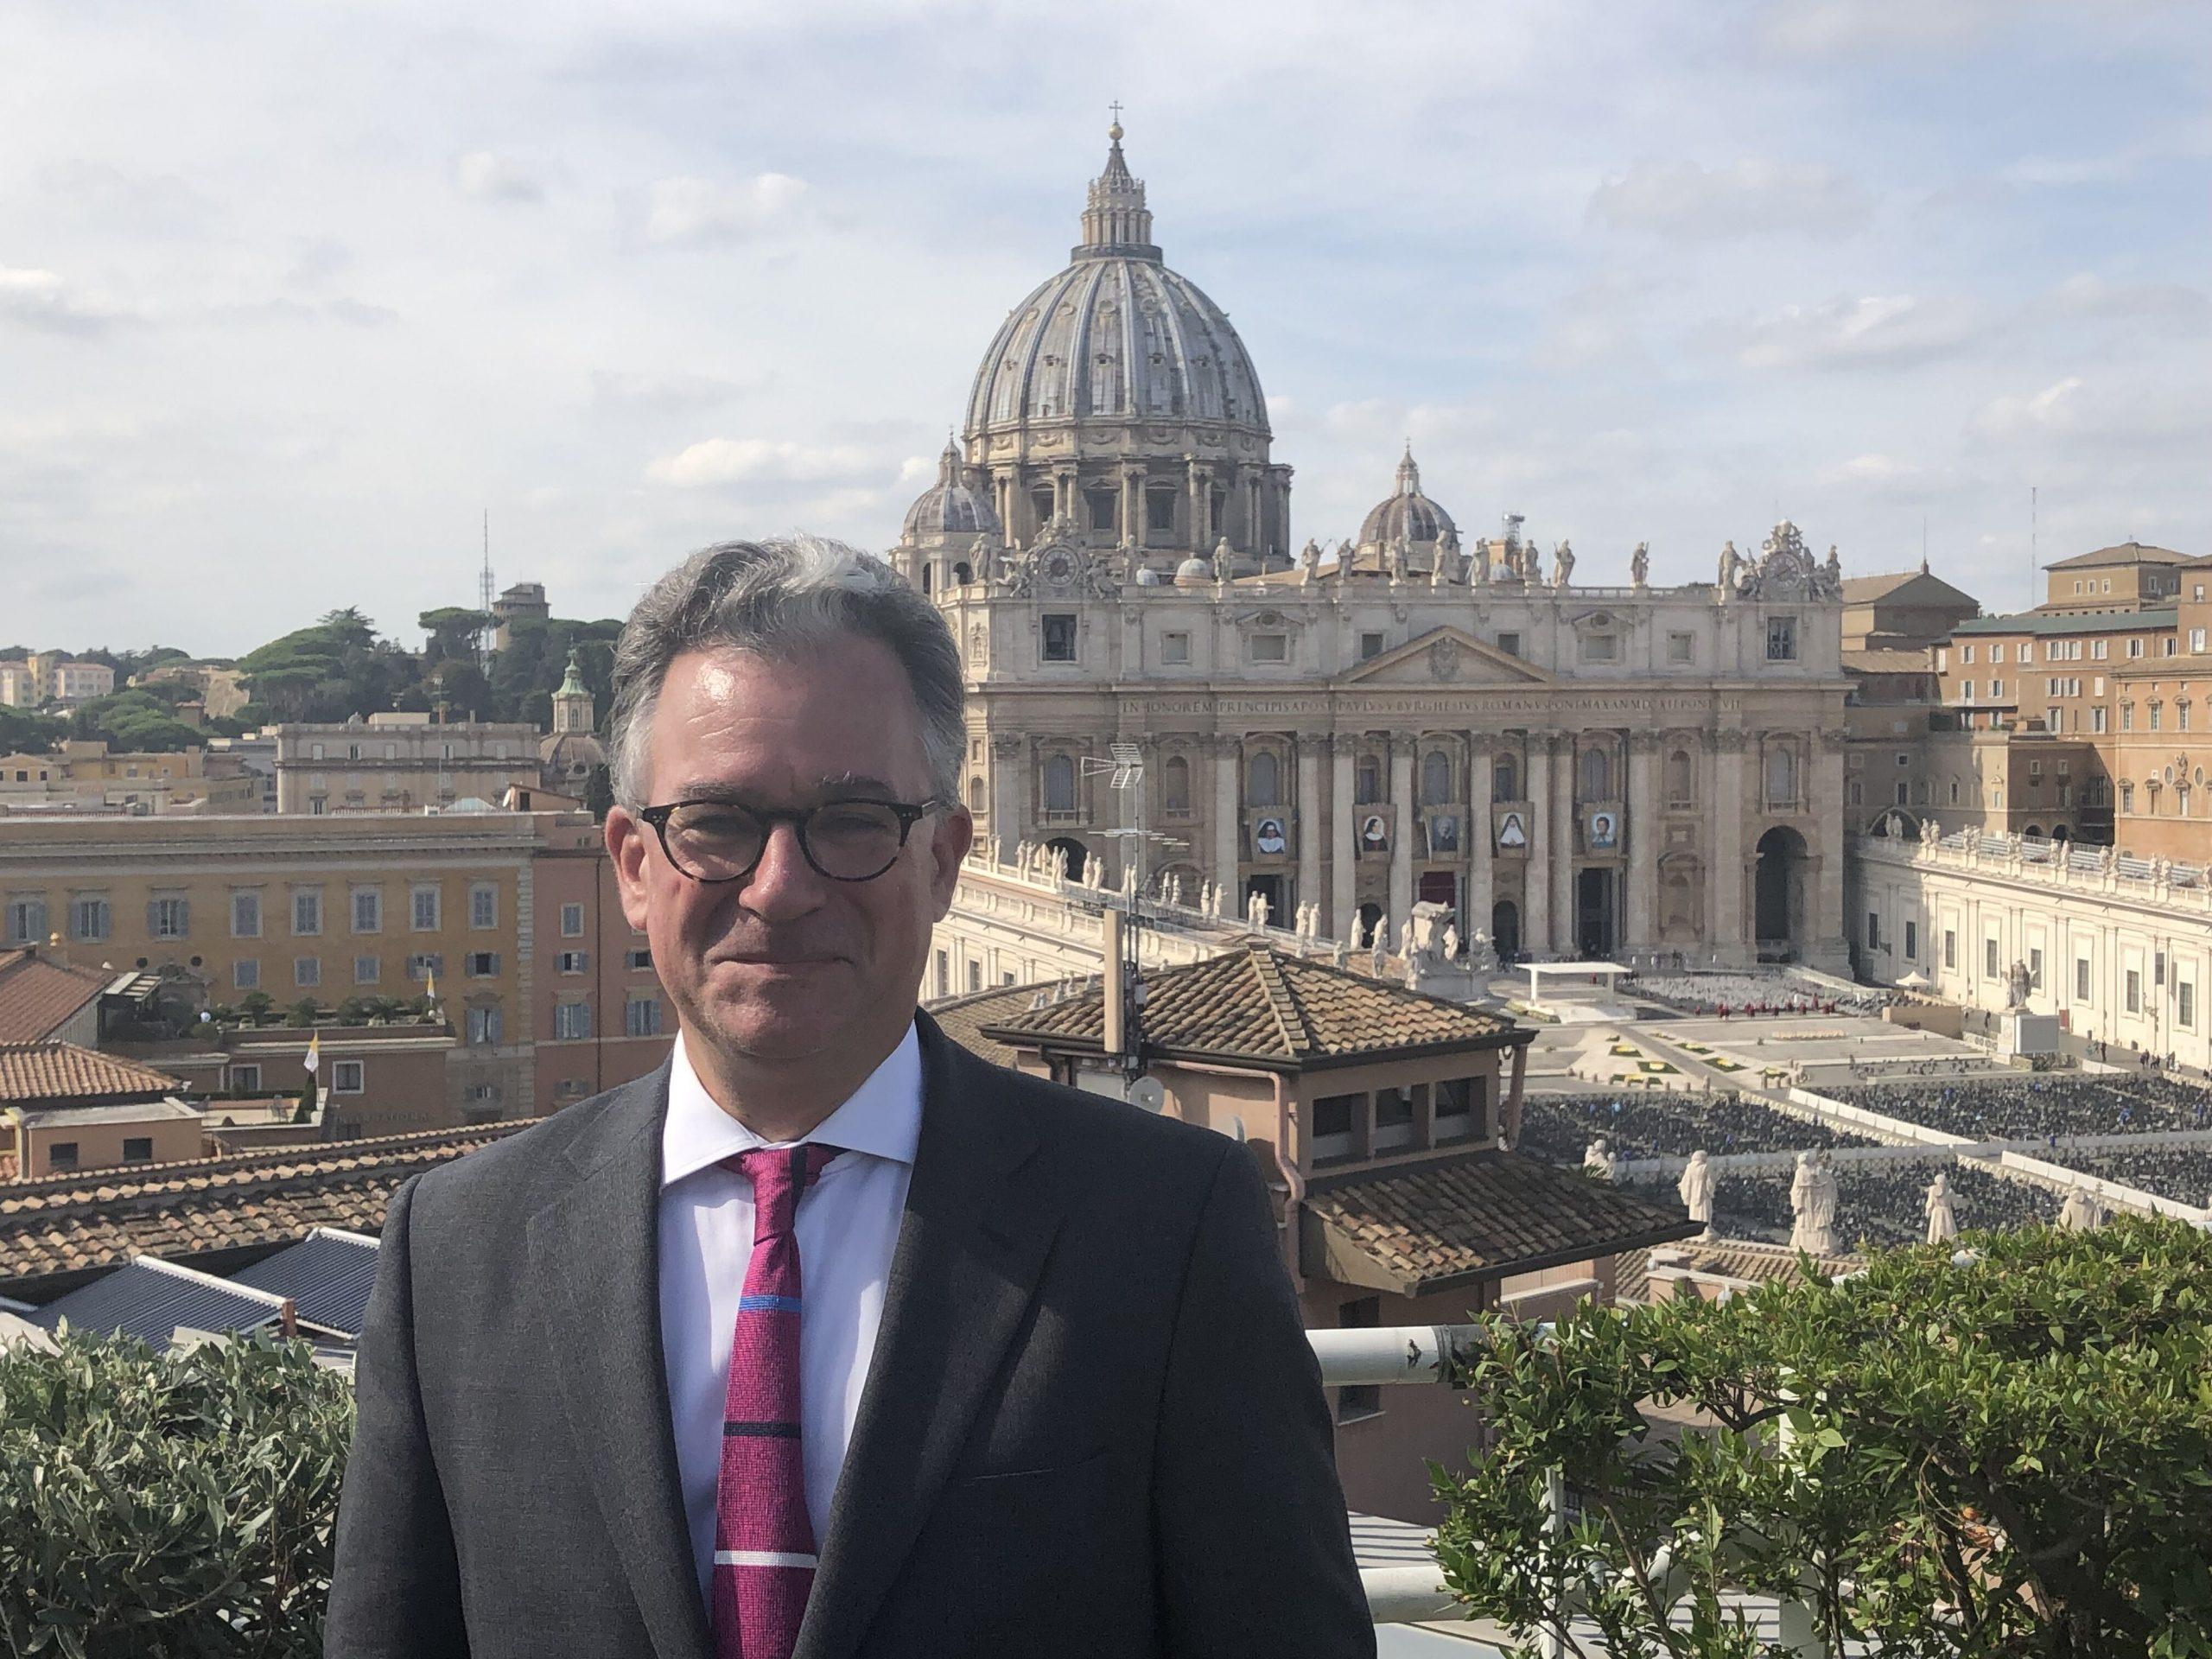 Austen Ivereigh on evangelization in the post-pandemic world